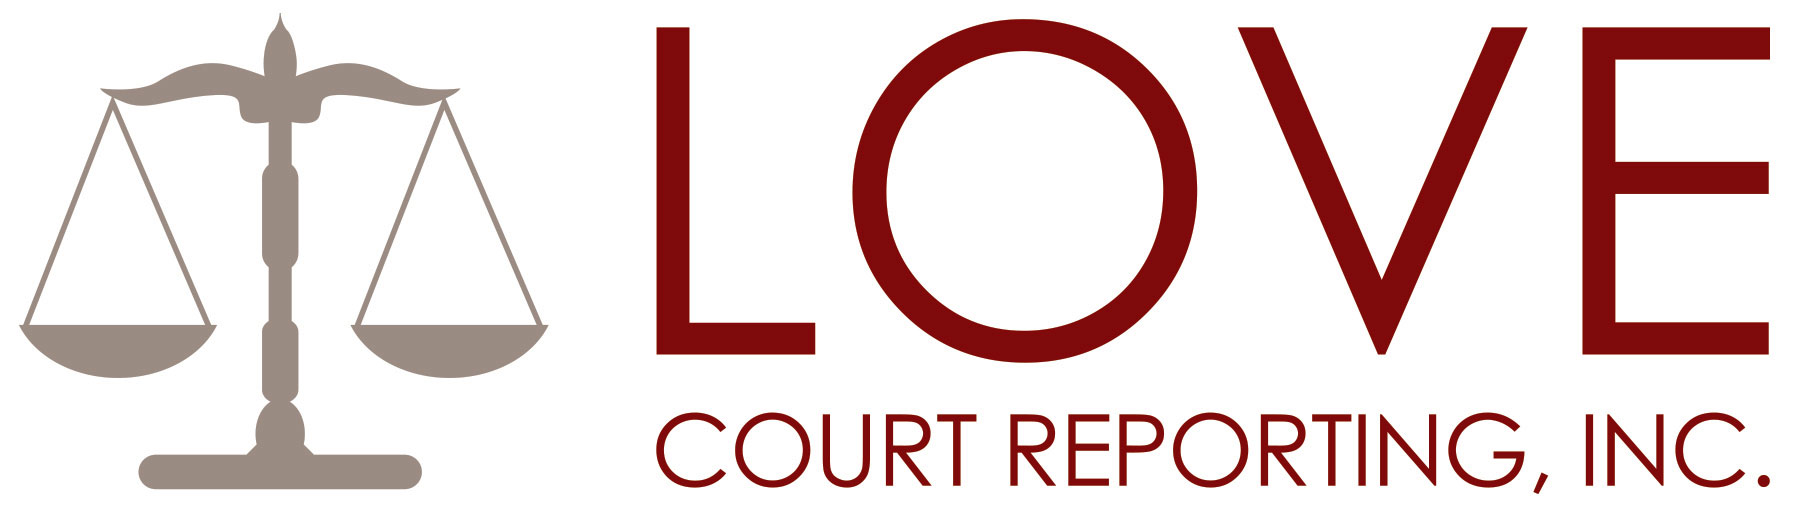 LCR-logo